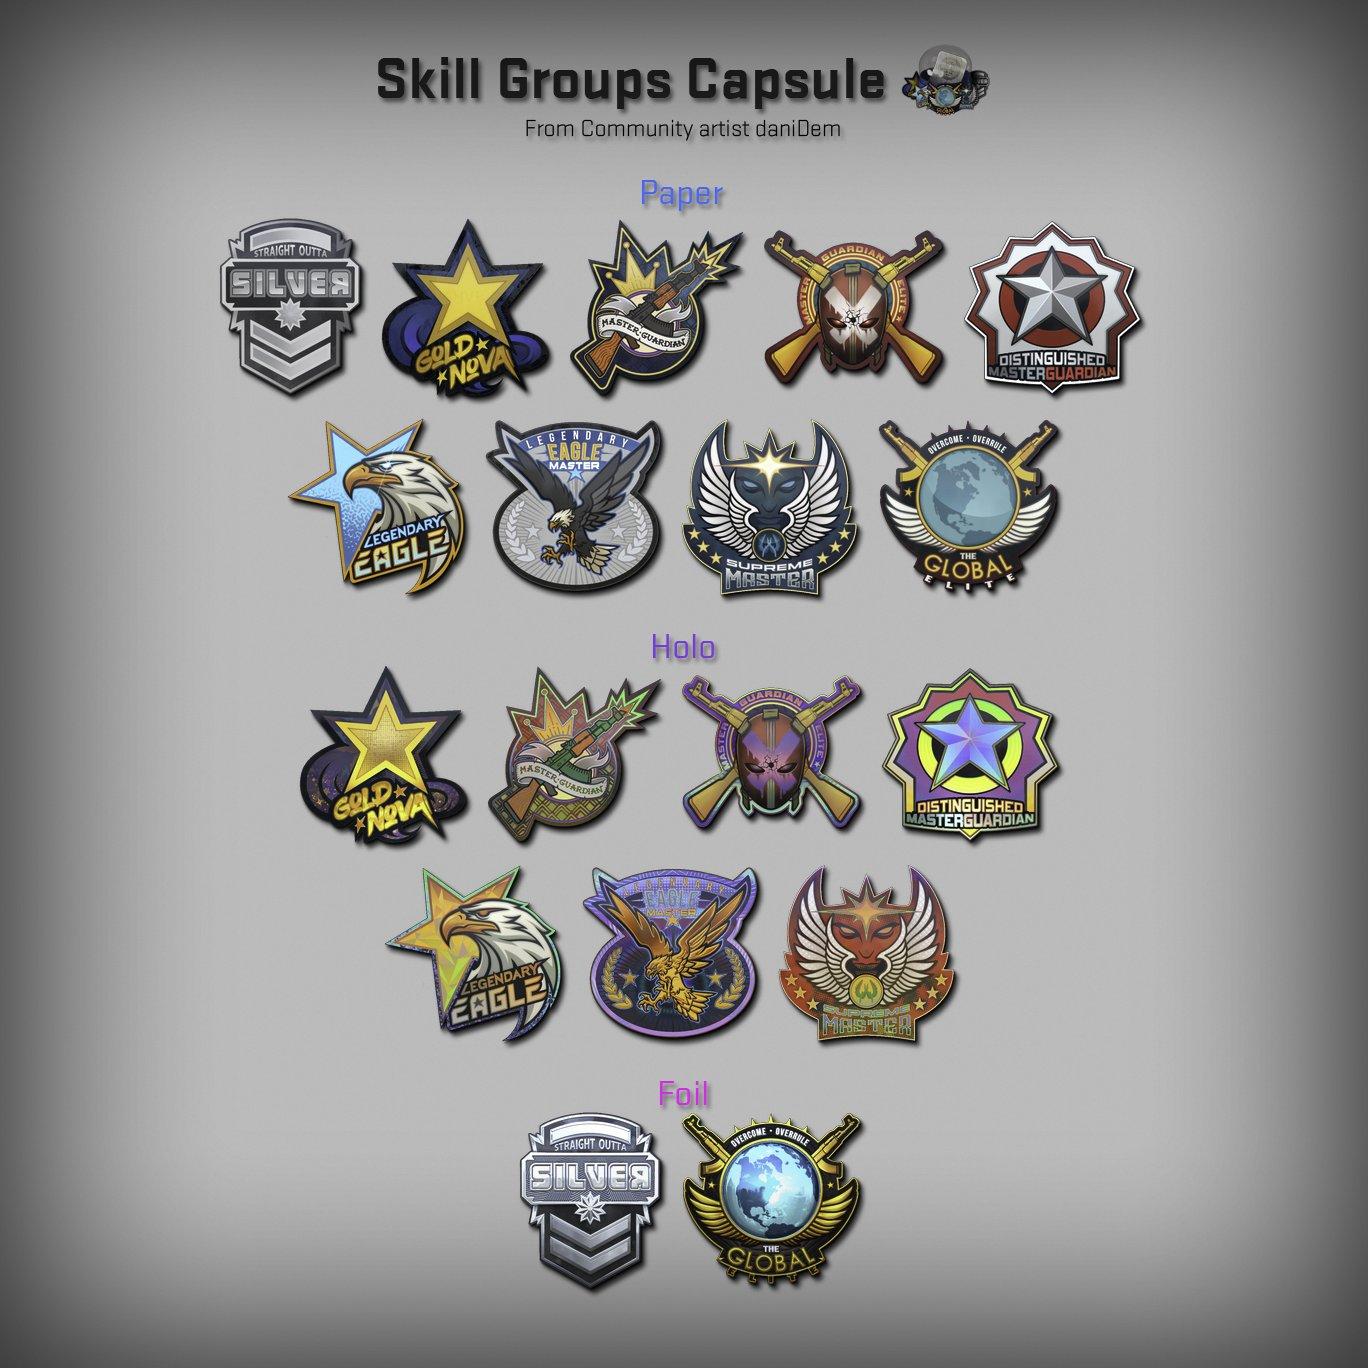 CS GO updates for Nov 14, 2018 - GameConnect